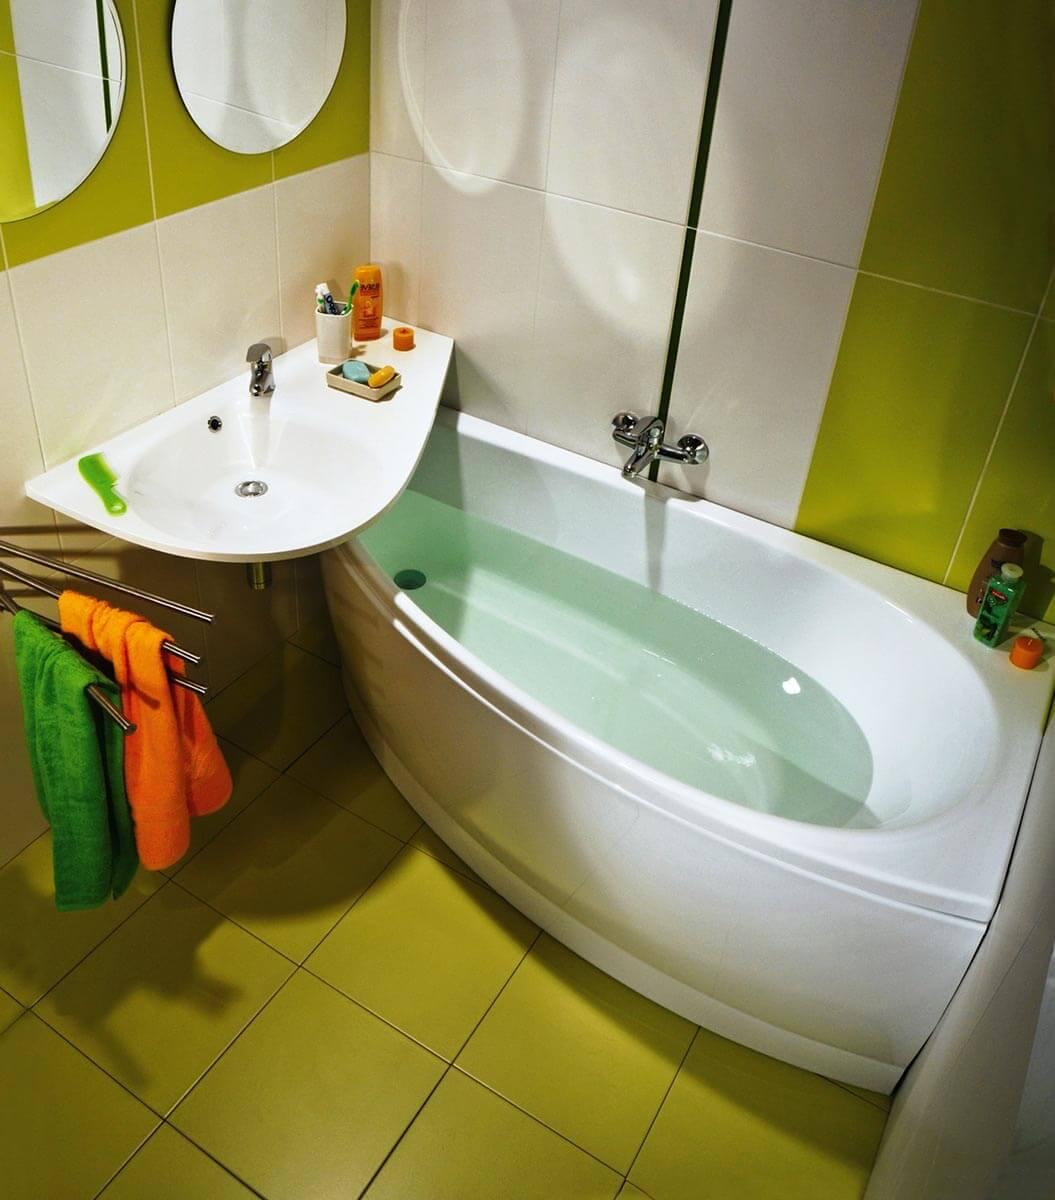 Дизайн угловых маленьких ванных комнат